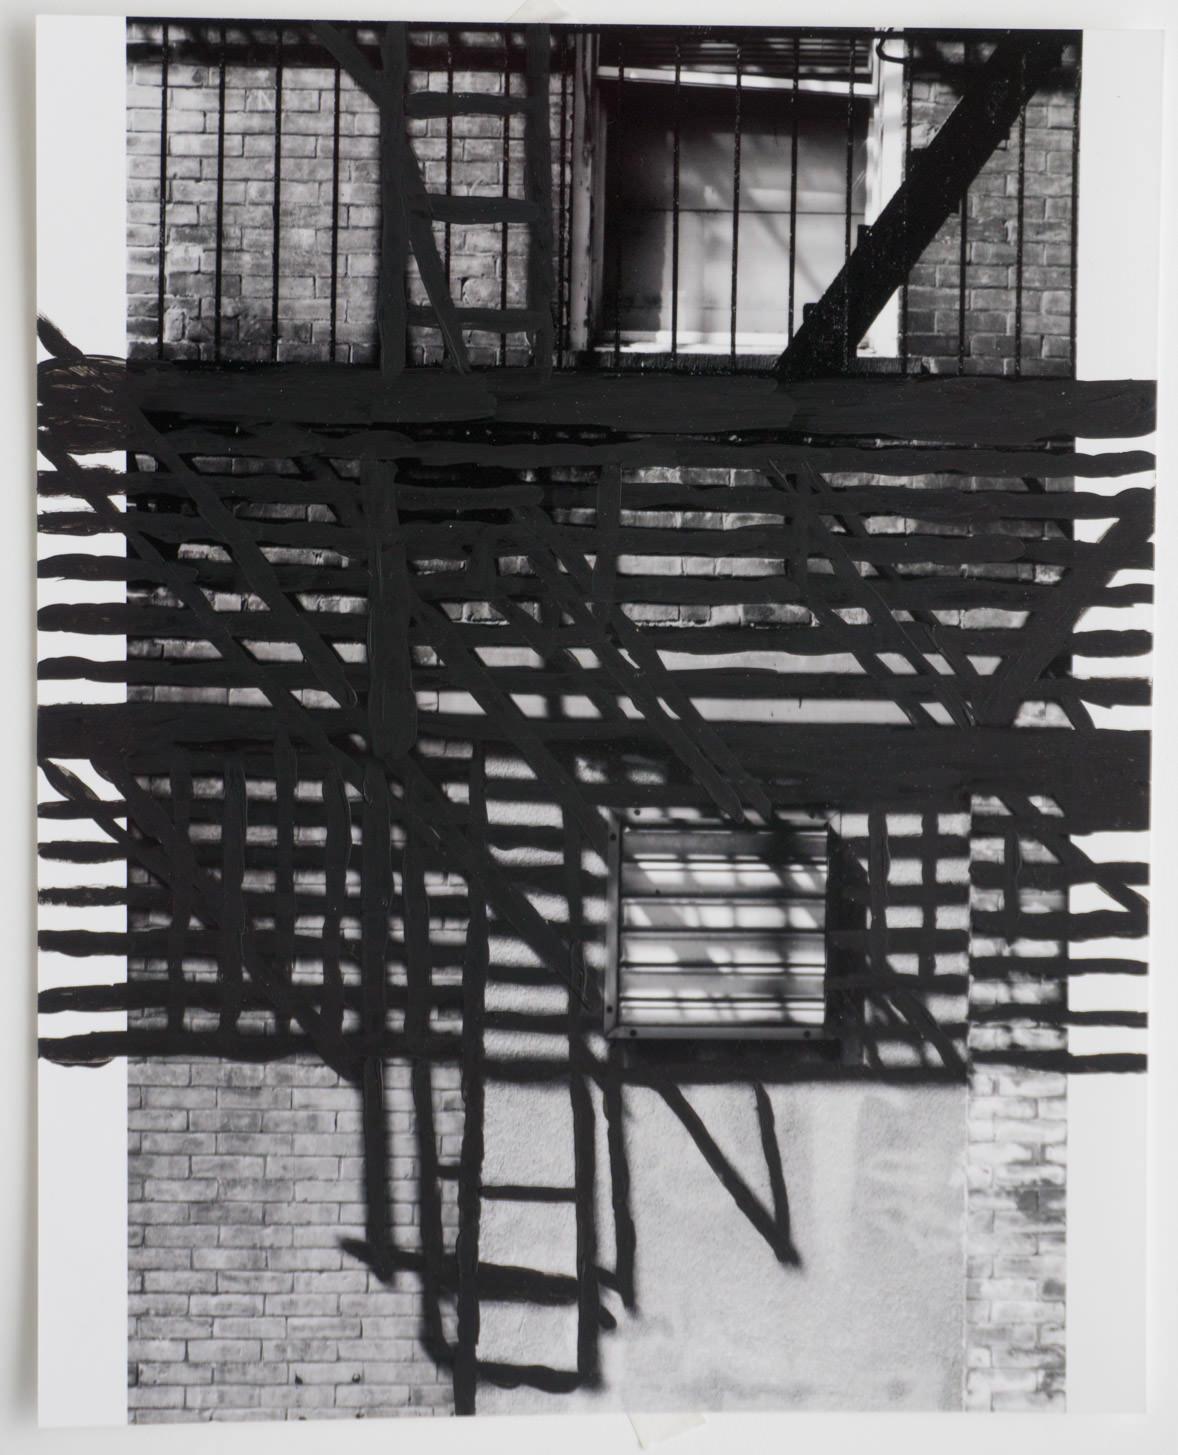 BW shadows   (8x10 - print - acrylic